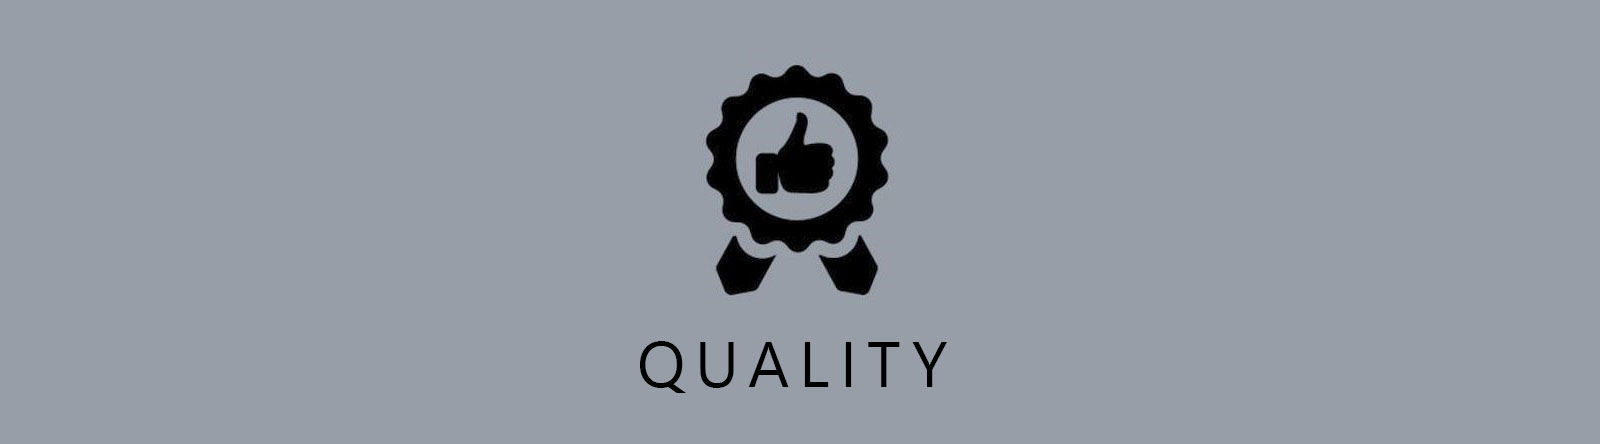 Quality image